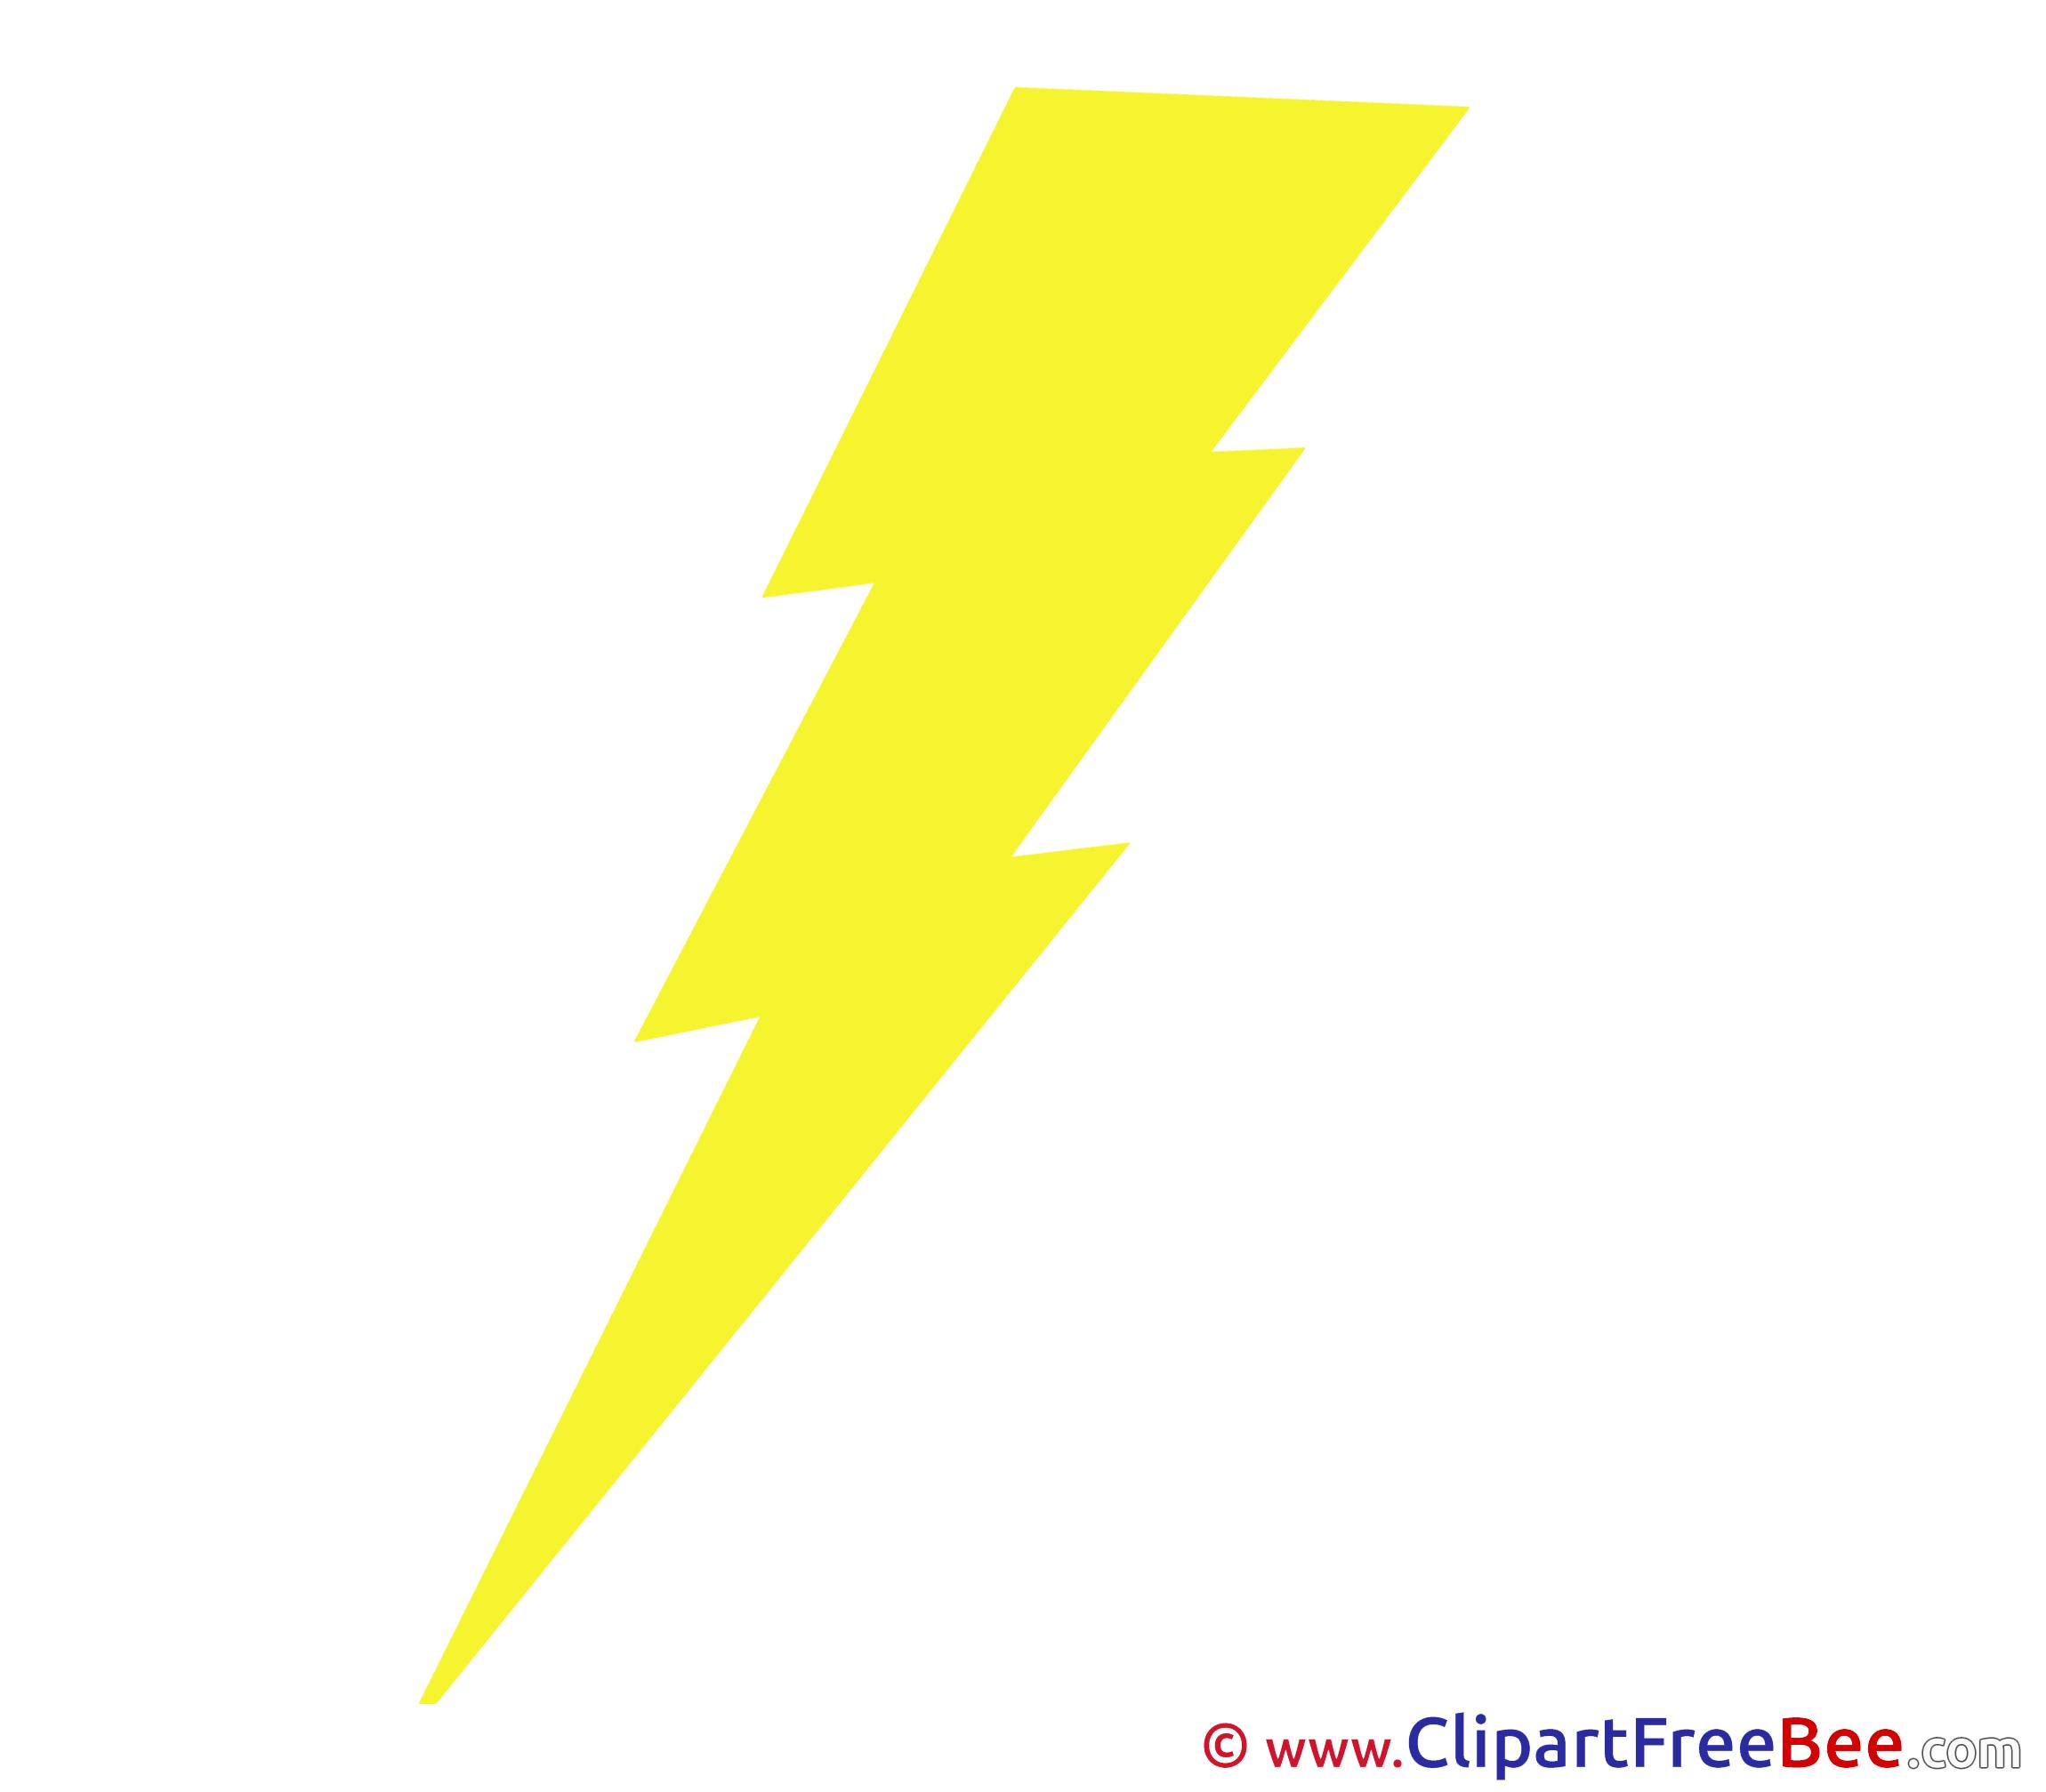 Lightning Clipart free Image download